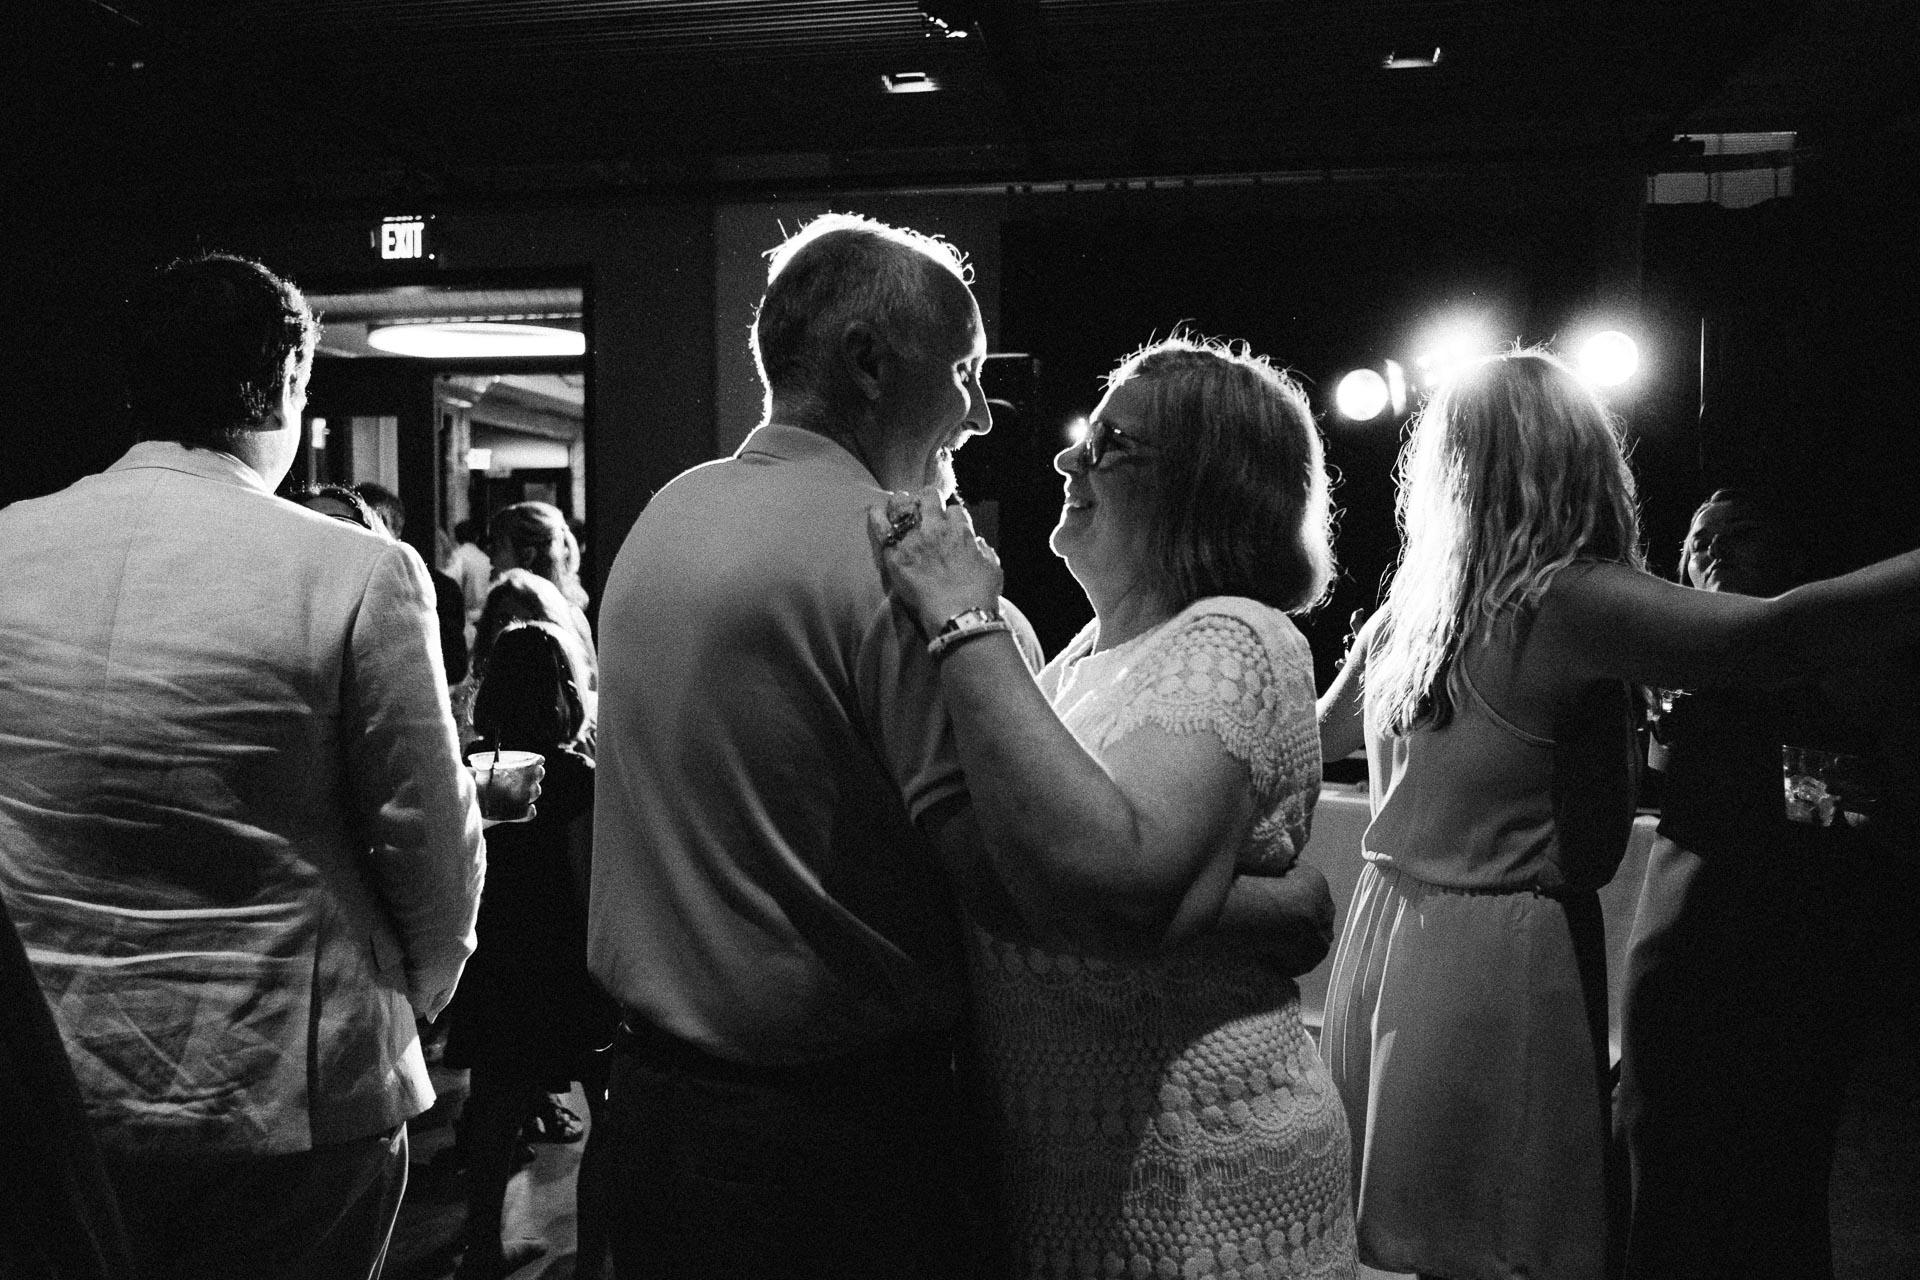 minneapolis-wedding-photographer-a-mill-artist-lofts0025